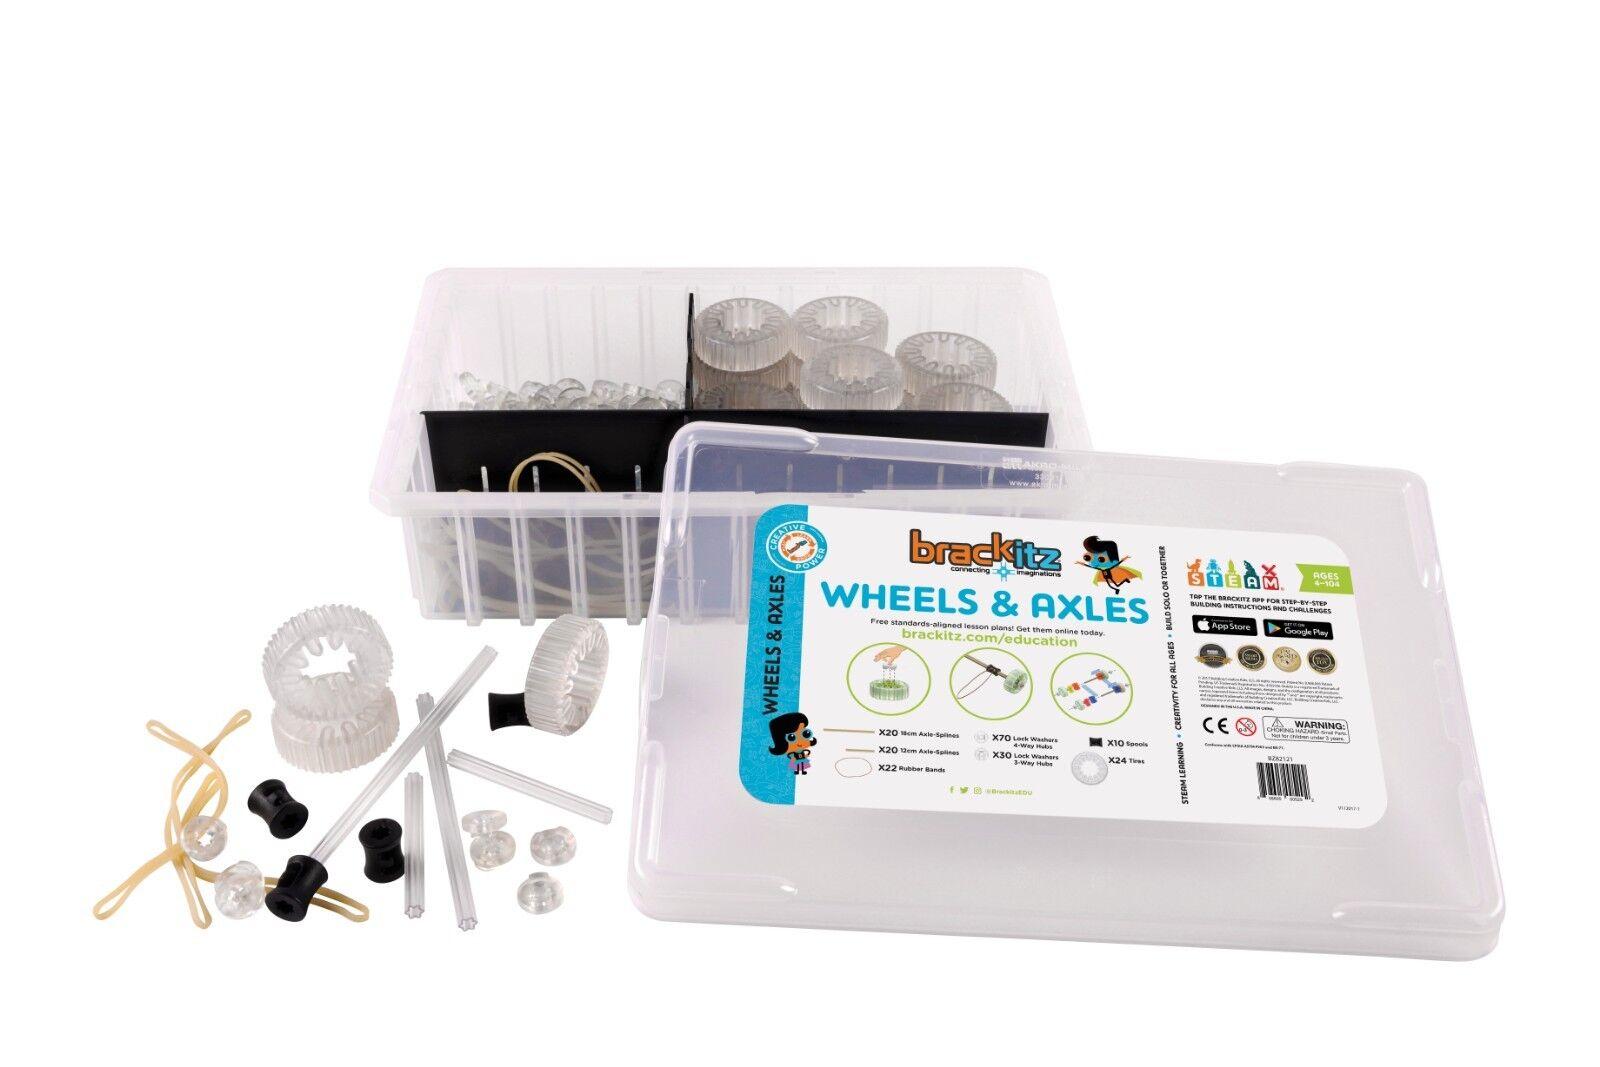 196-pc-brackitz-wheels-axles-stem-learning-toys-teaching-kids-homeschool